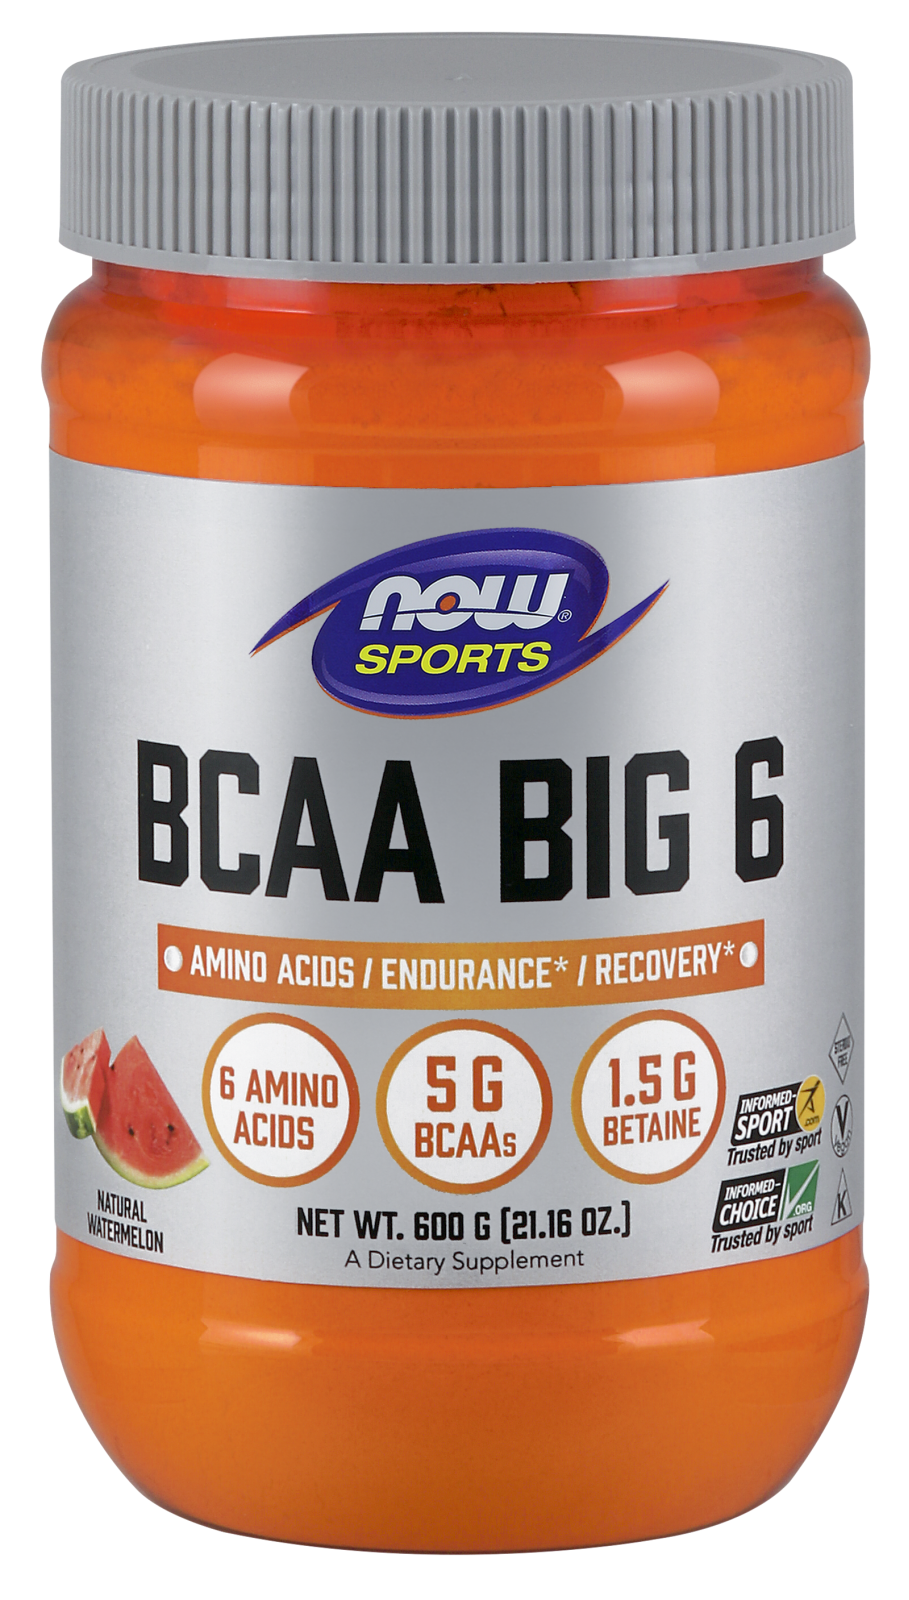 BCAA Big 6, Watermelon Flavor - 600 g